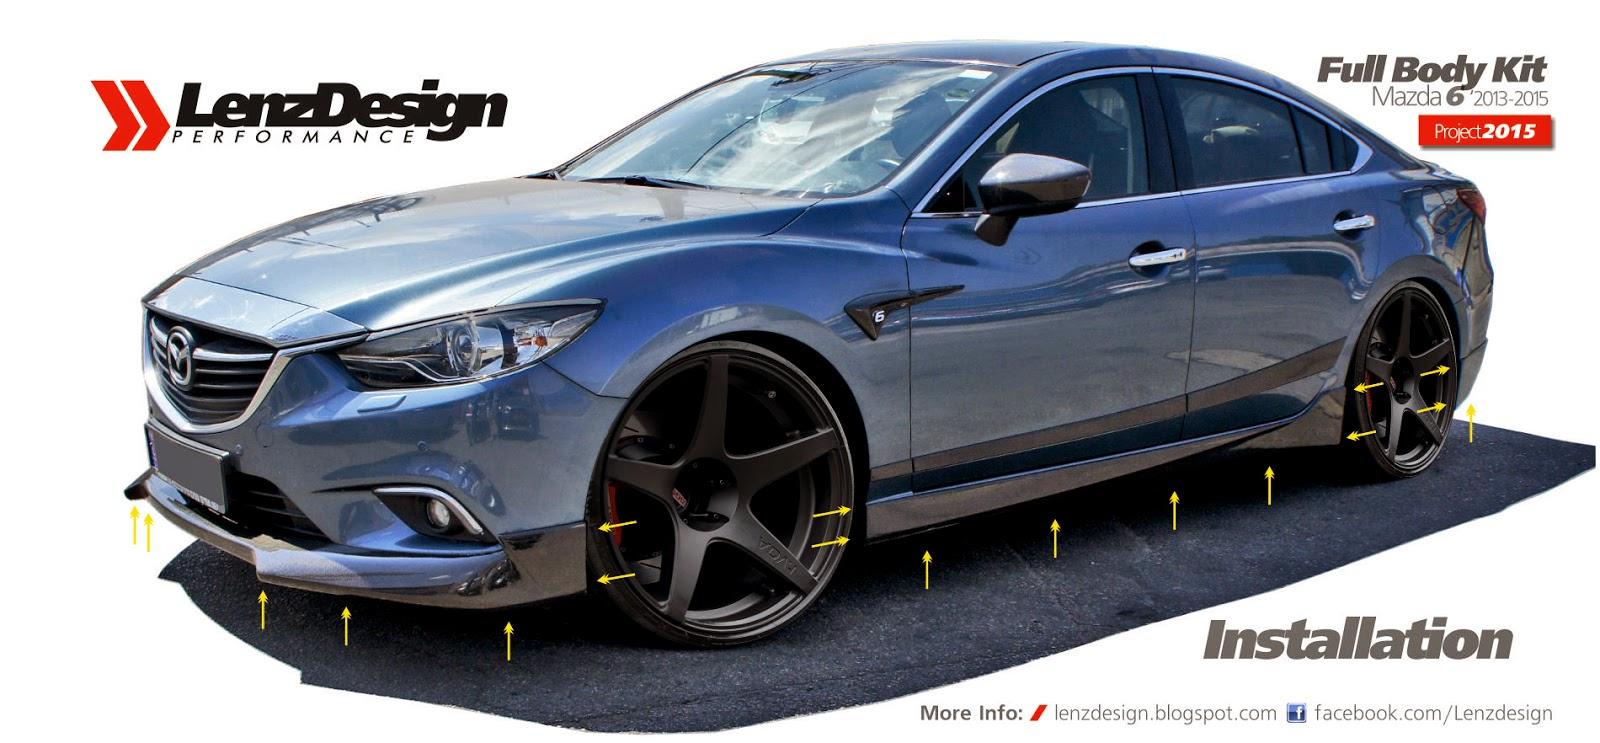 Mazda 6 Gj Atenza Tuning Amp Body Kit Lenzdesign Performance 2013 2014 2015 2016 2017